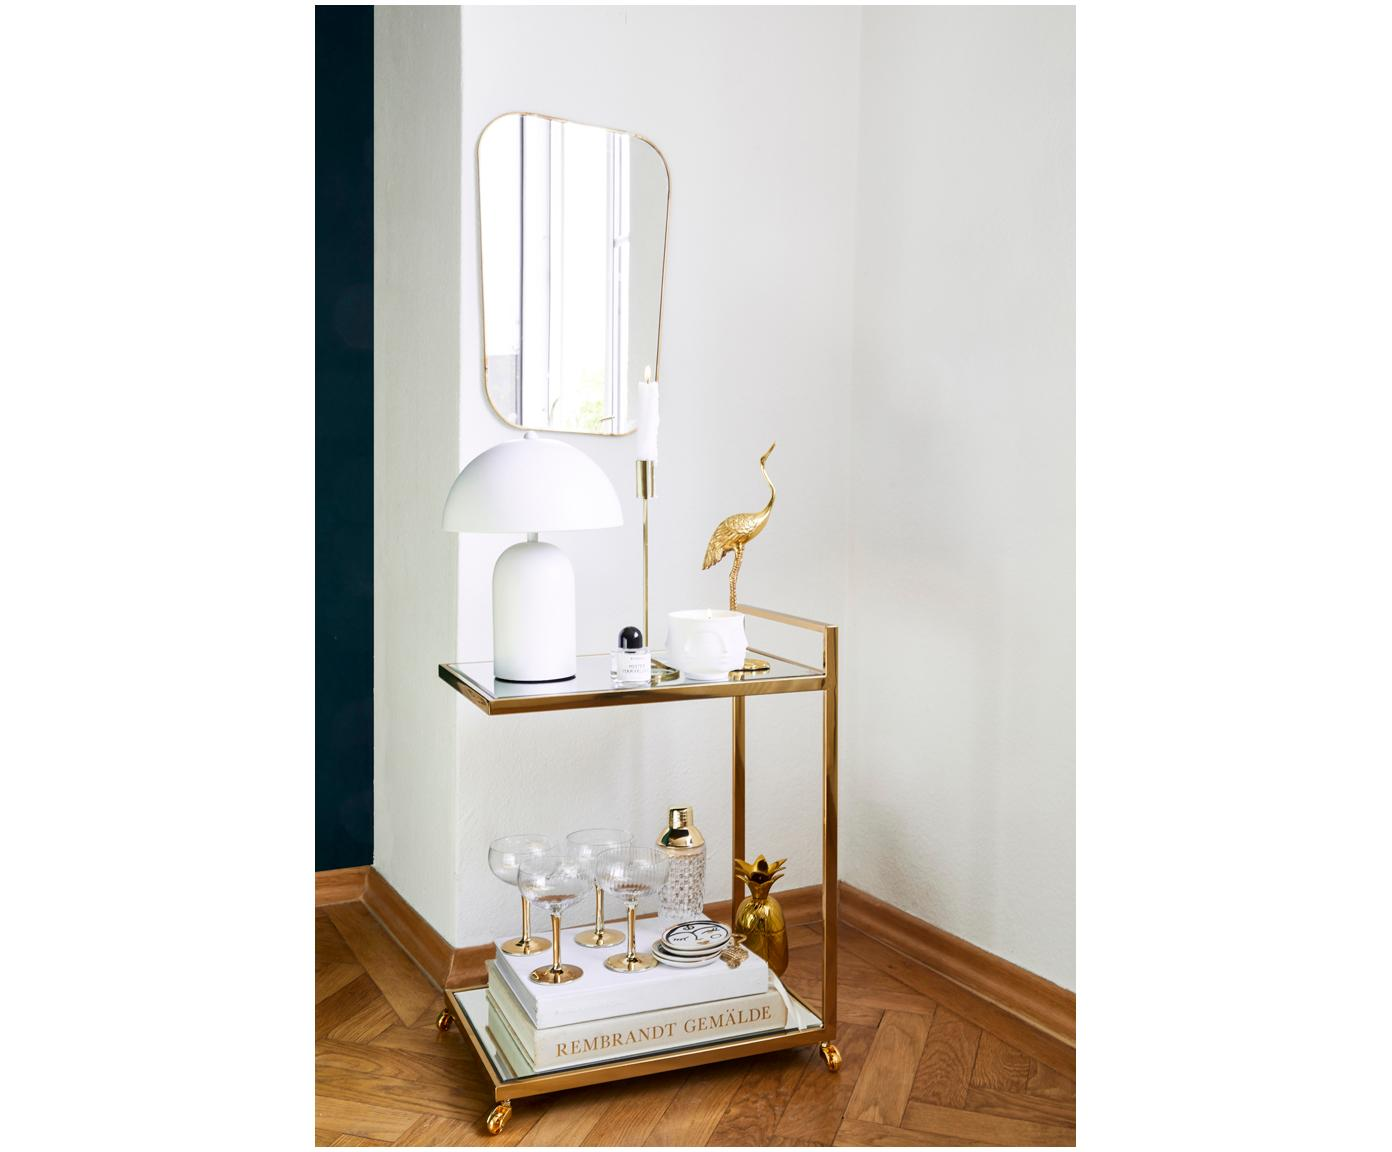 Kerzenhalter Goldie, Metall, lackiert, Goldfarben, Ø 10 x H 29 cm